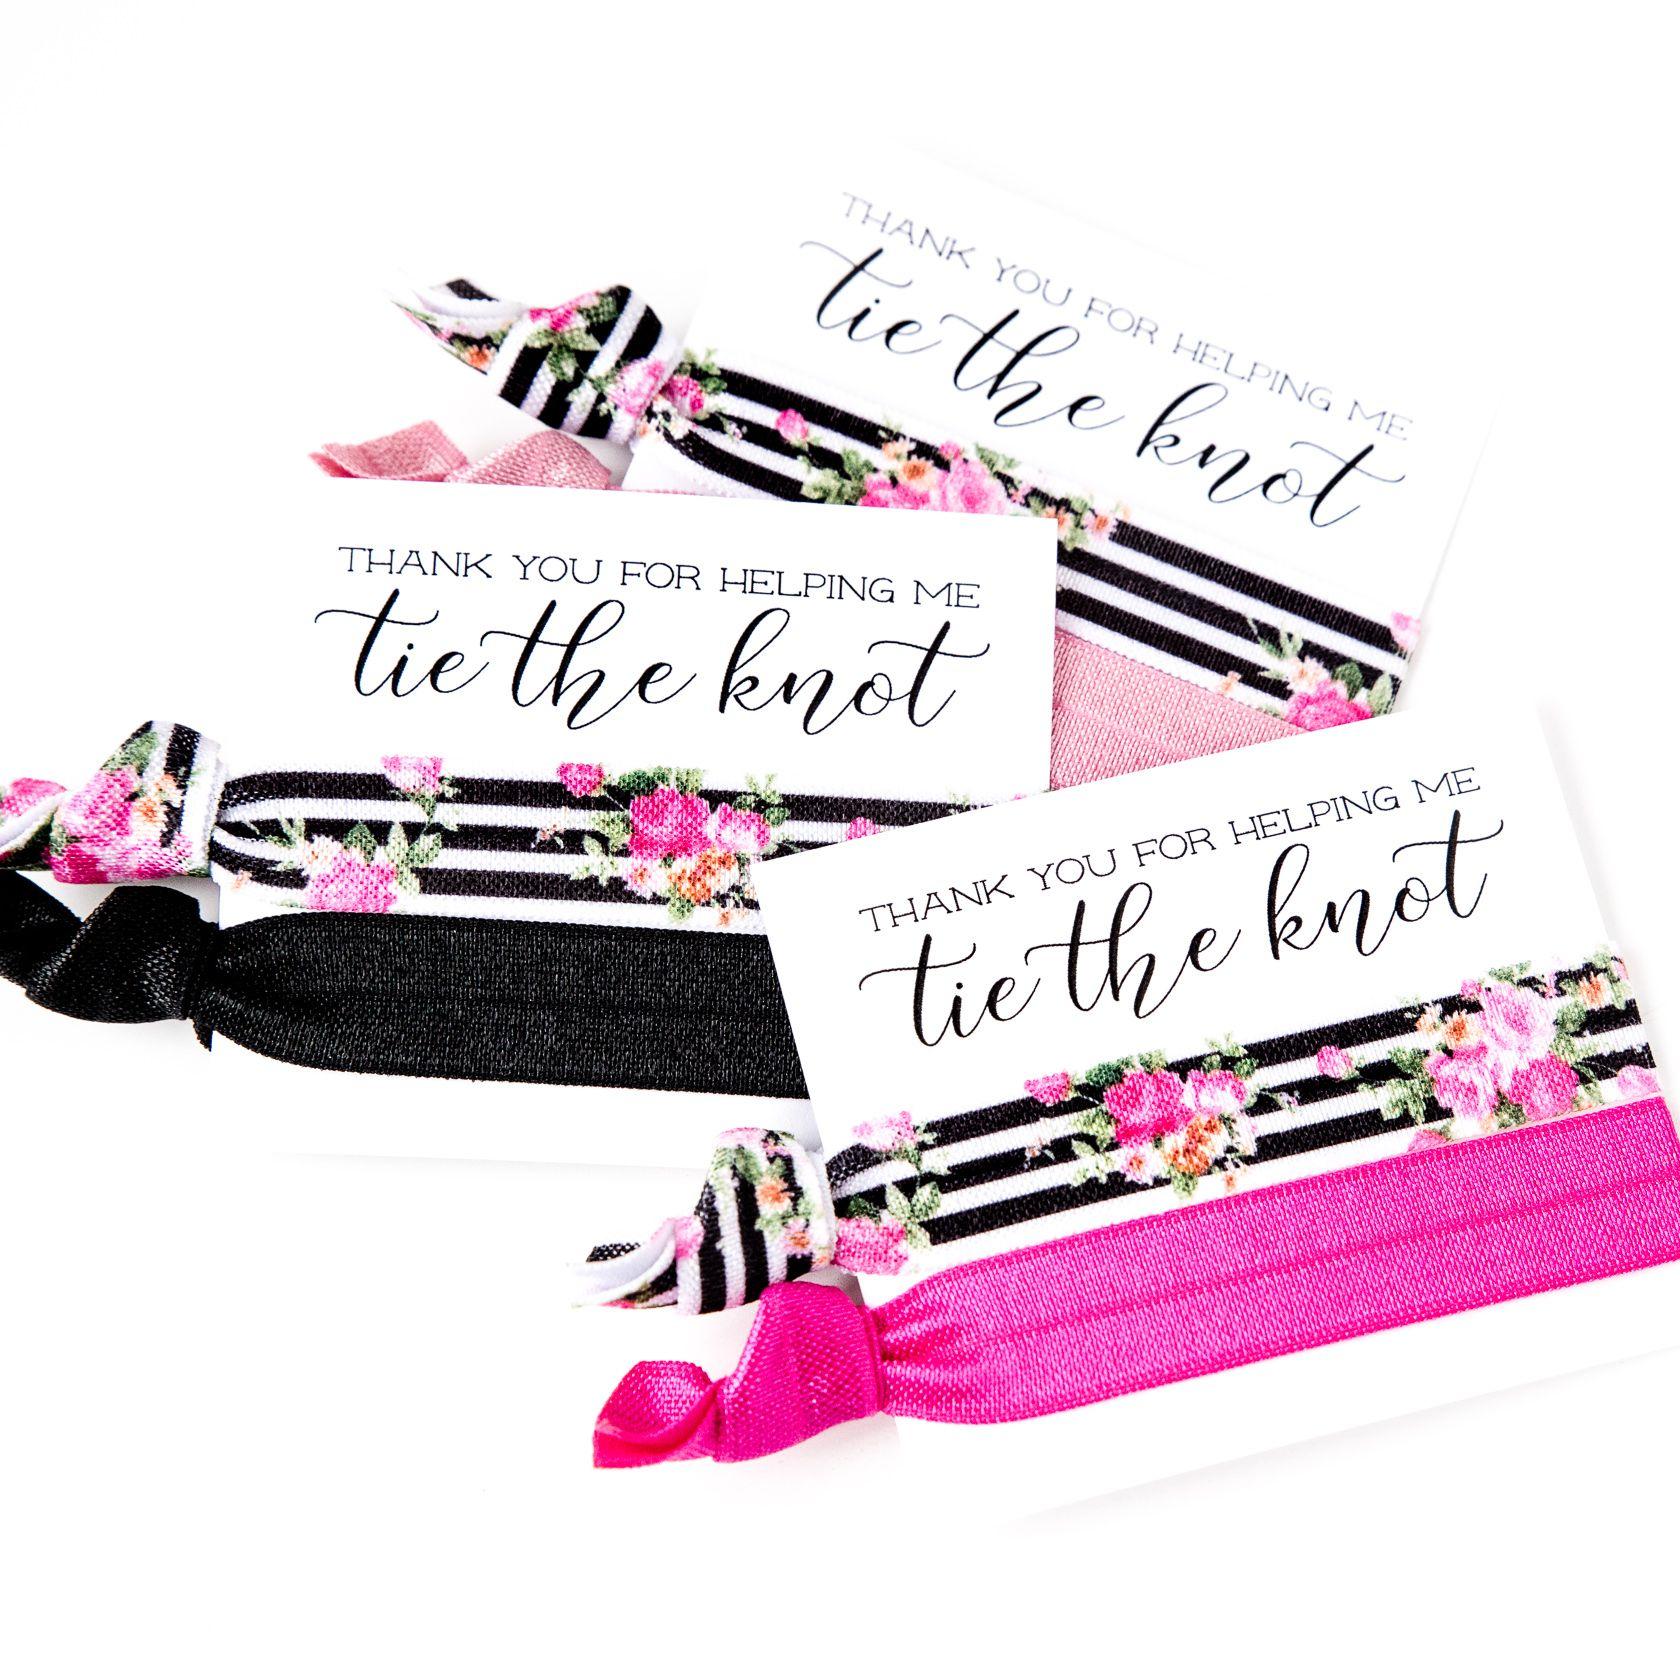 black #pink #hotpink #favor #gift #knot #hairtie #wedding #floral ...